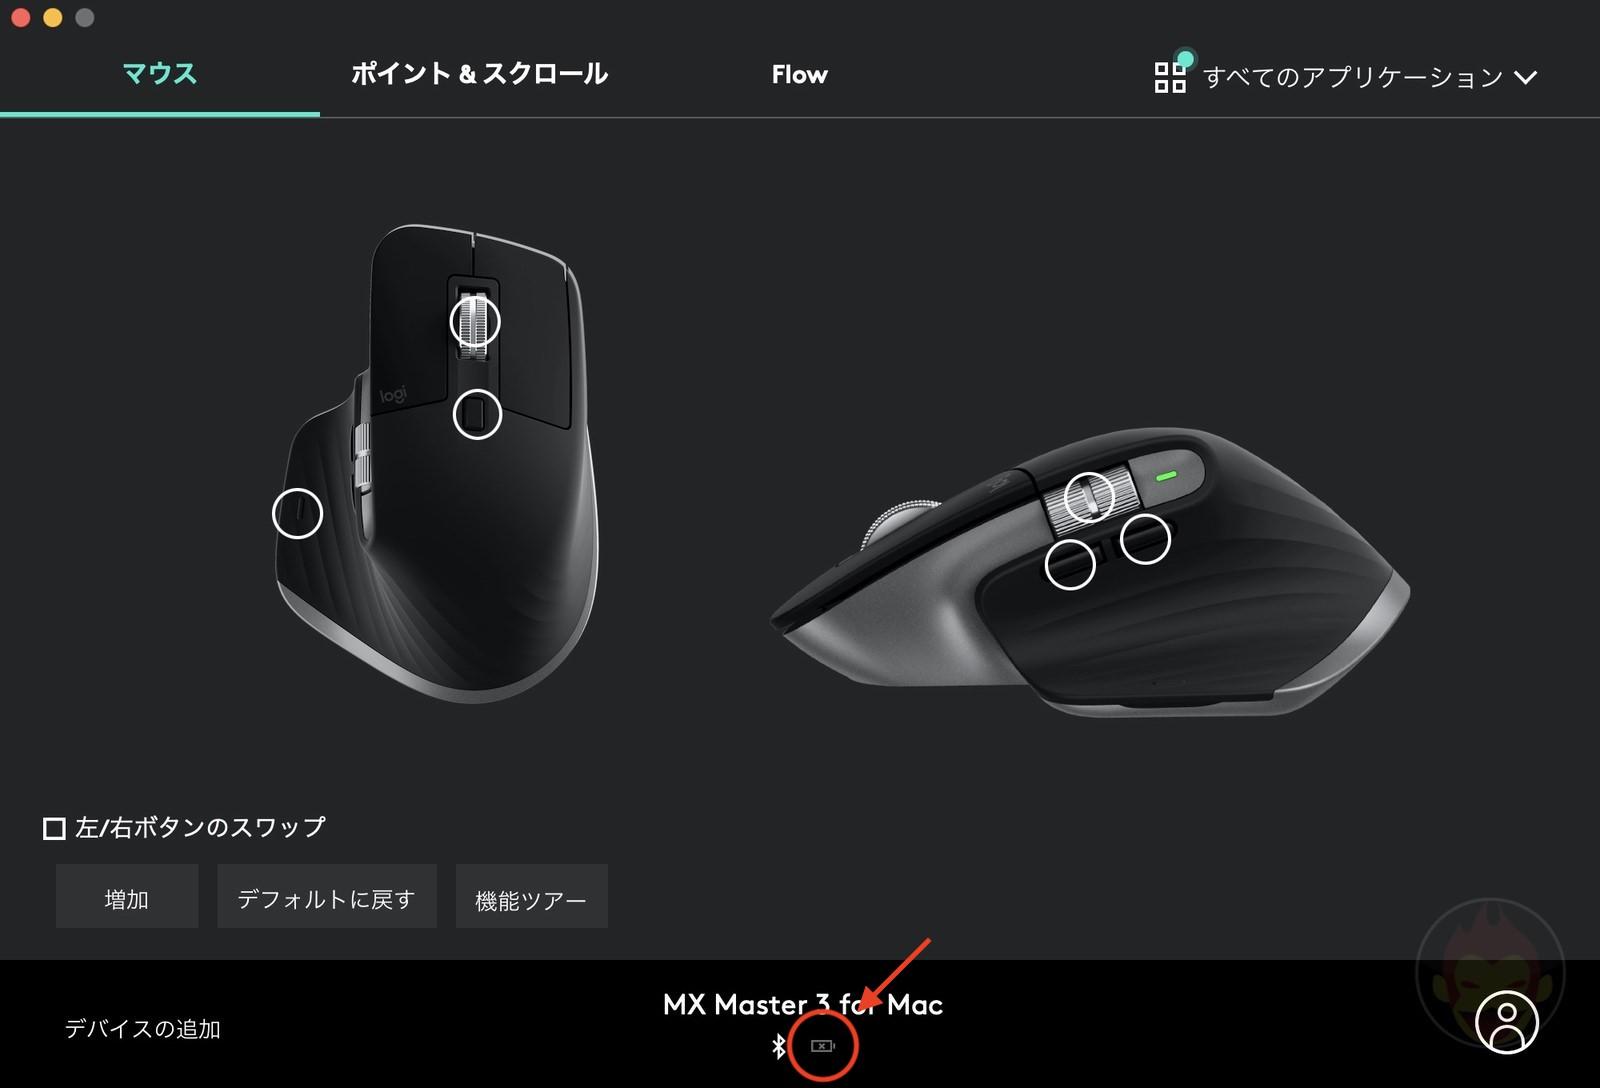 MX-Master-3-connection-trouble-m1-mac-fix-03.jpg